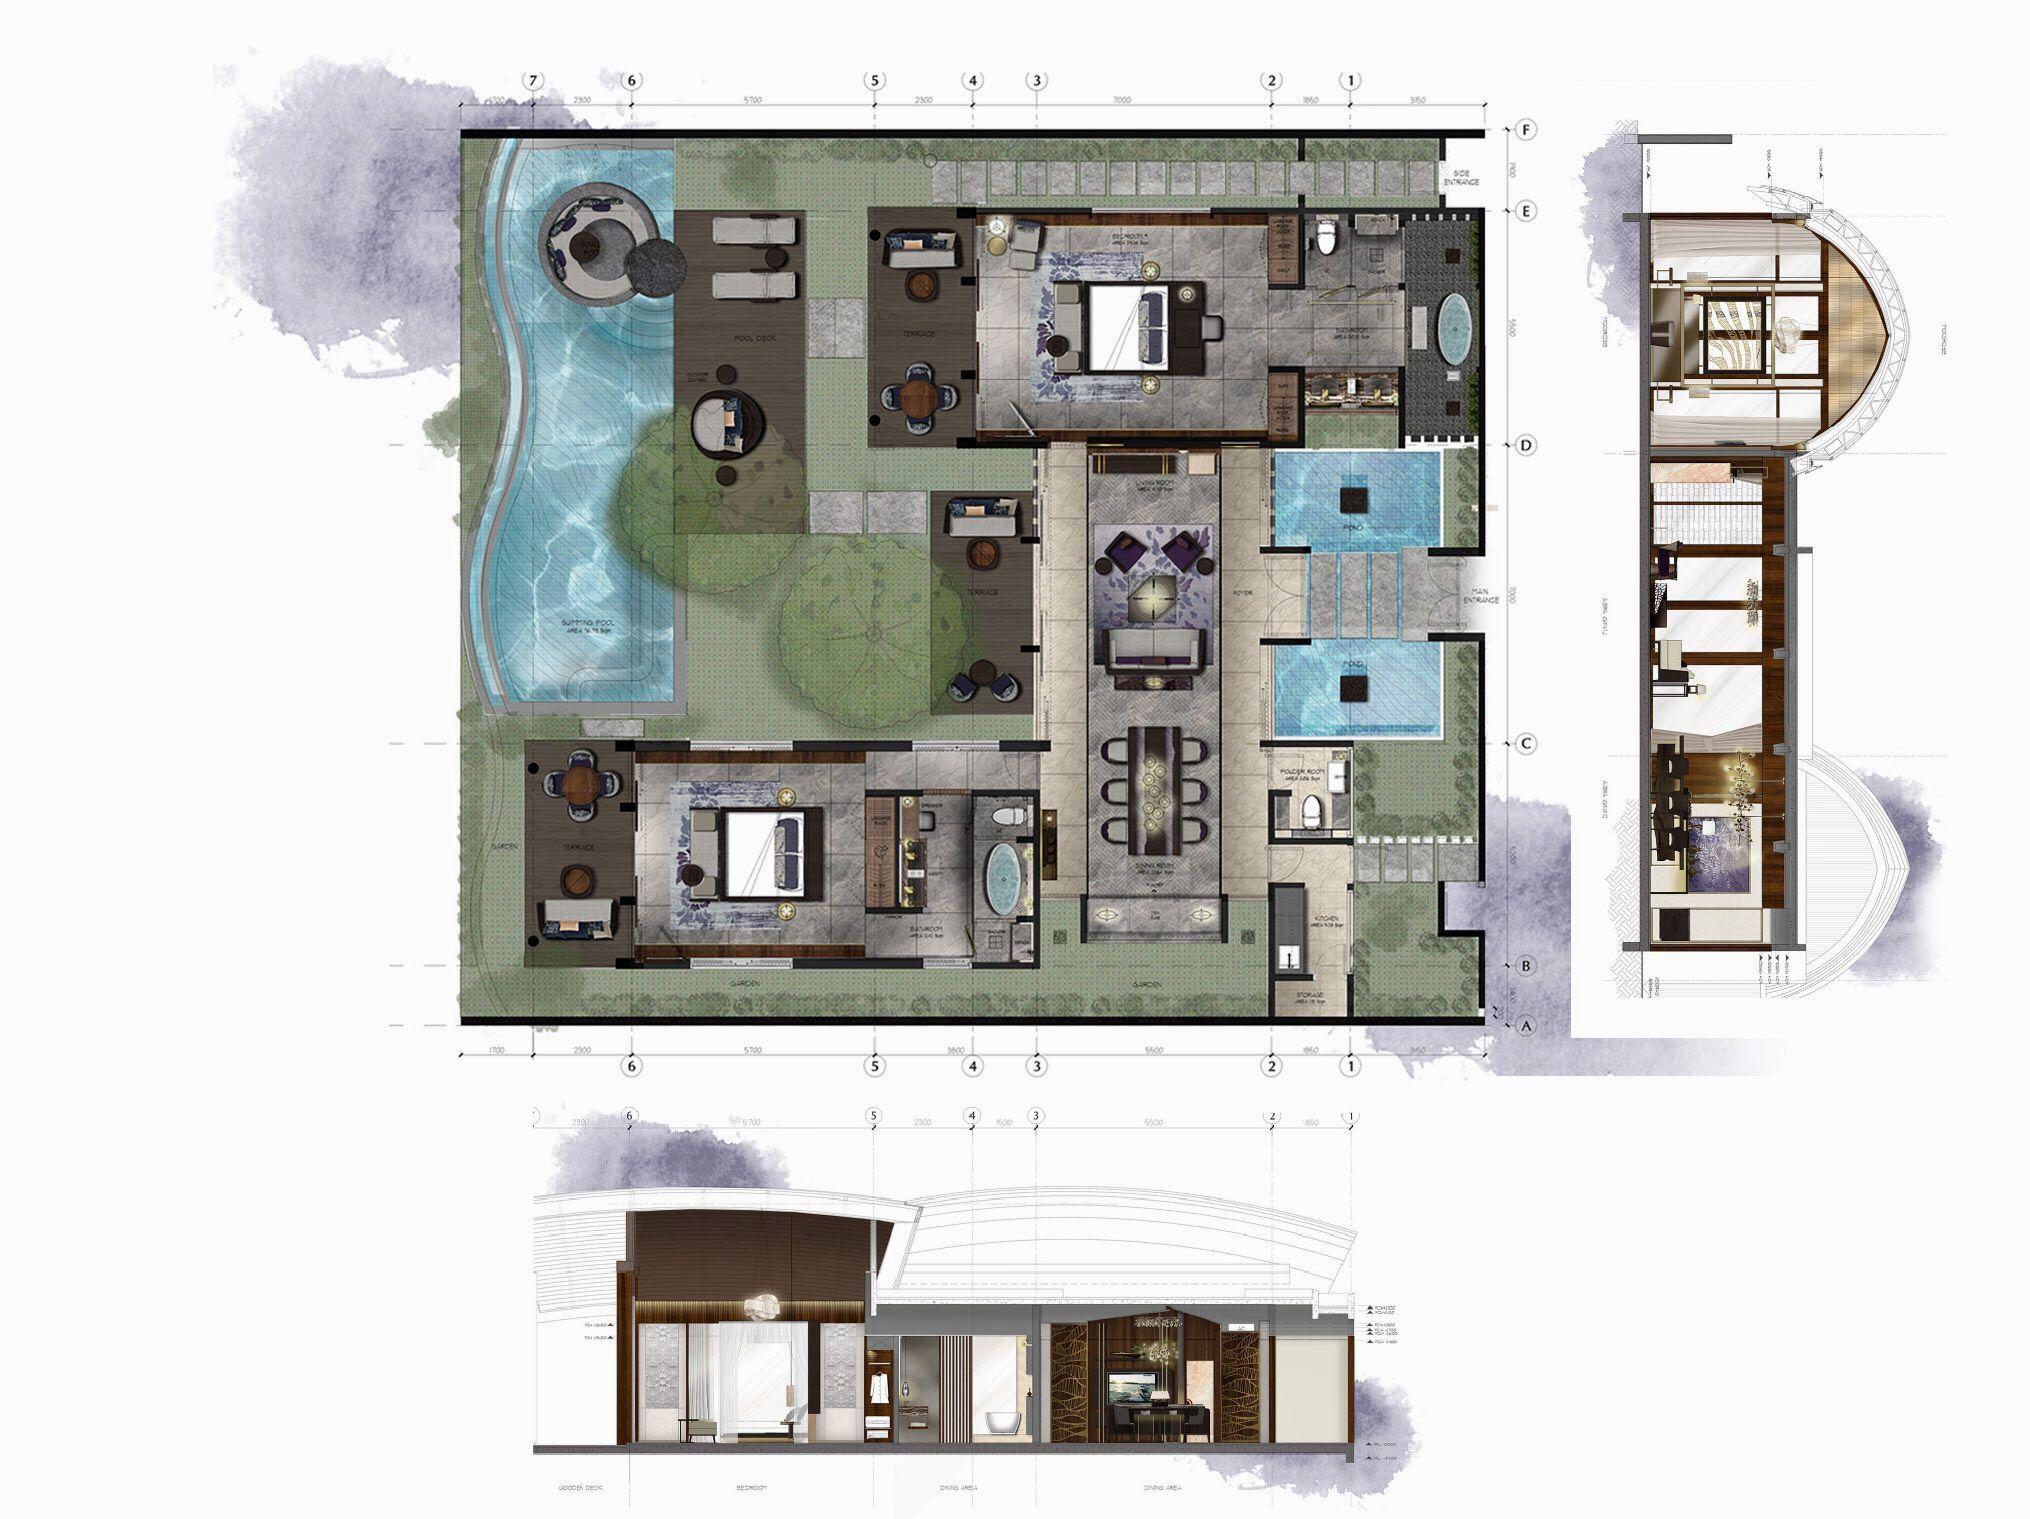 New World Grand Bali Resort 2bedroom Villa Bali House Bali Resort Resort Plan